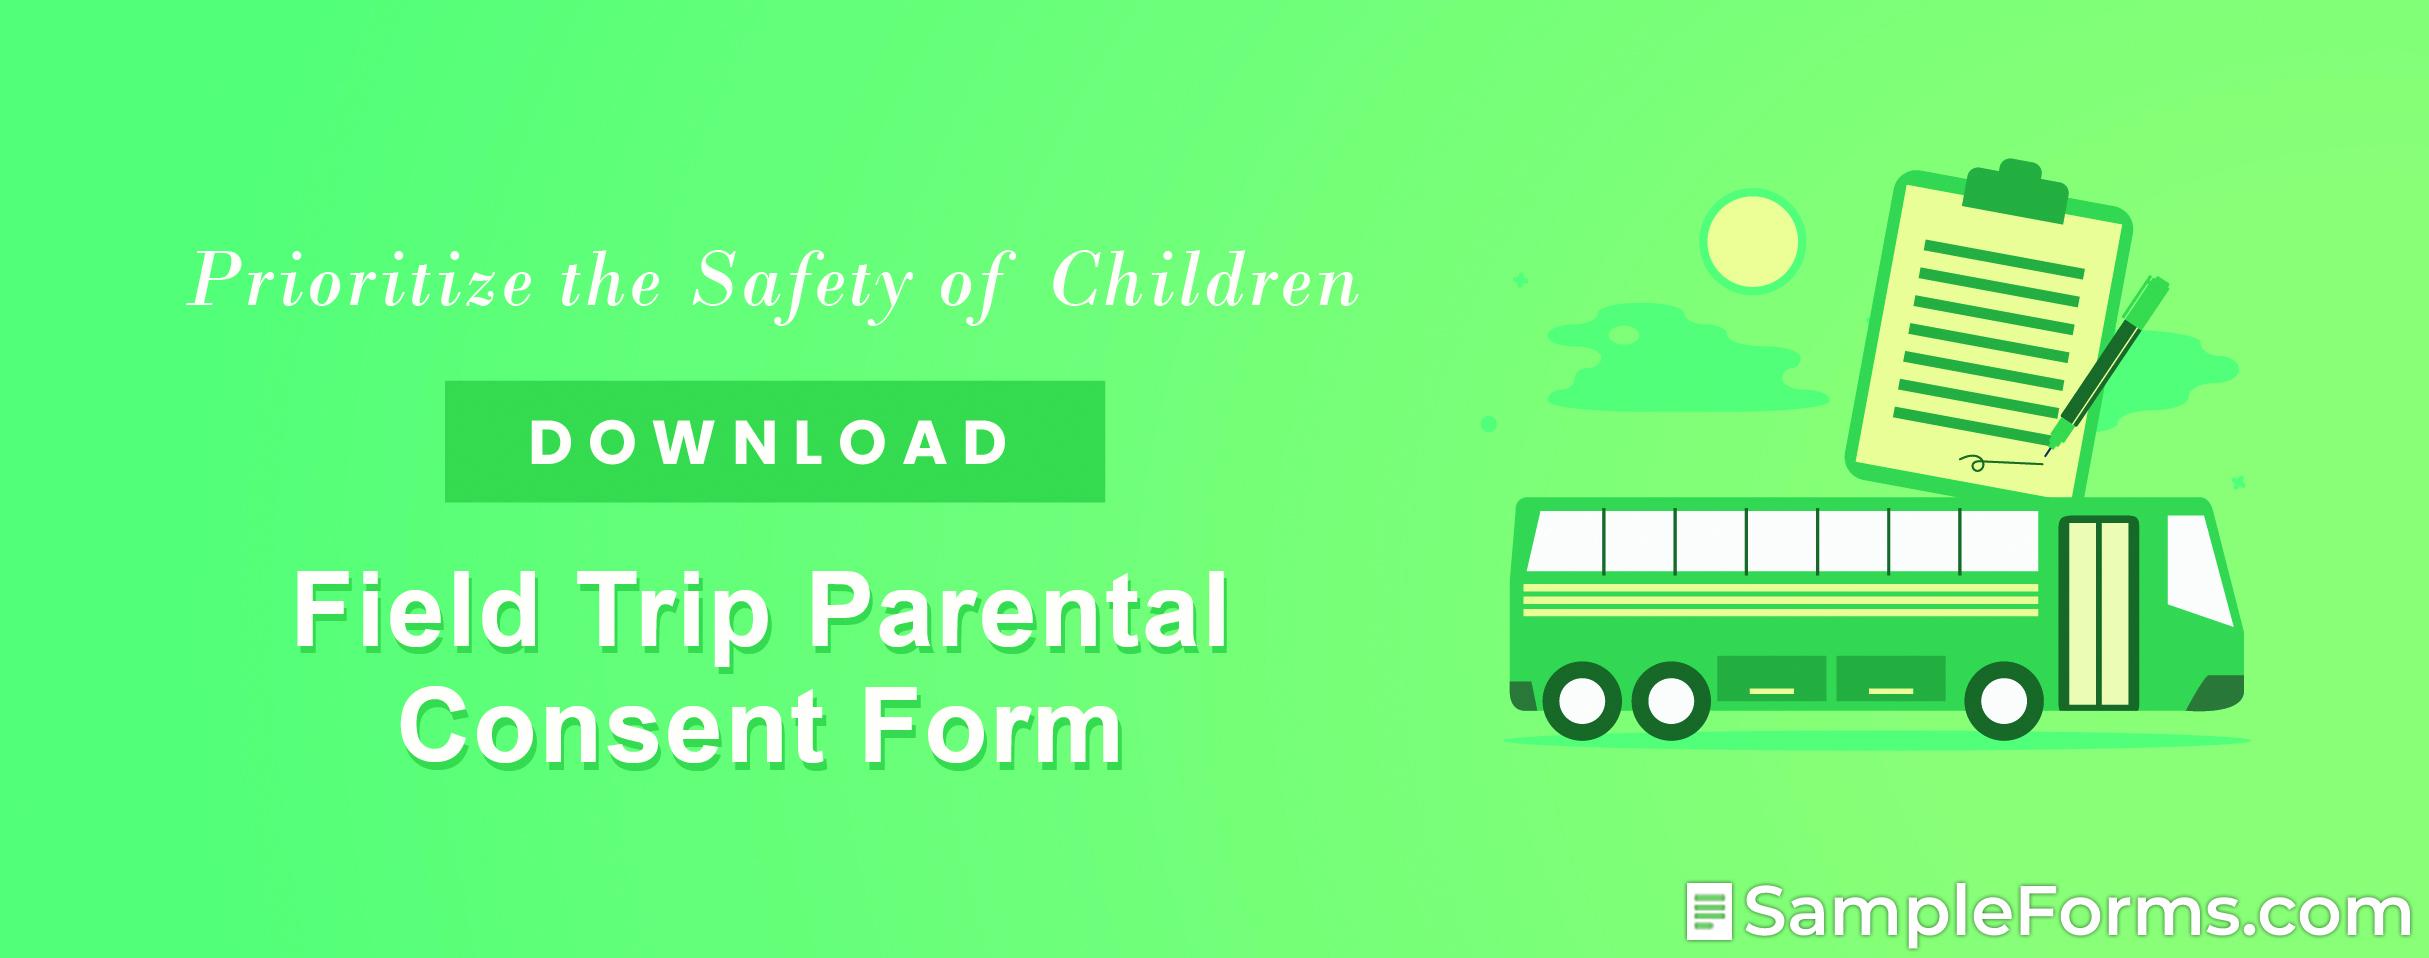 Field Trip Parental Consent Form1